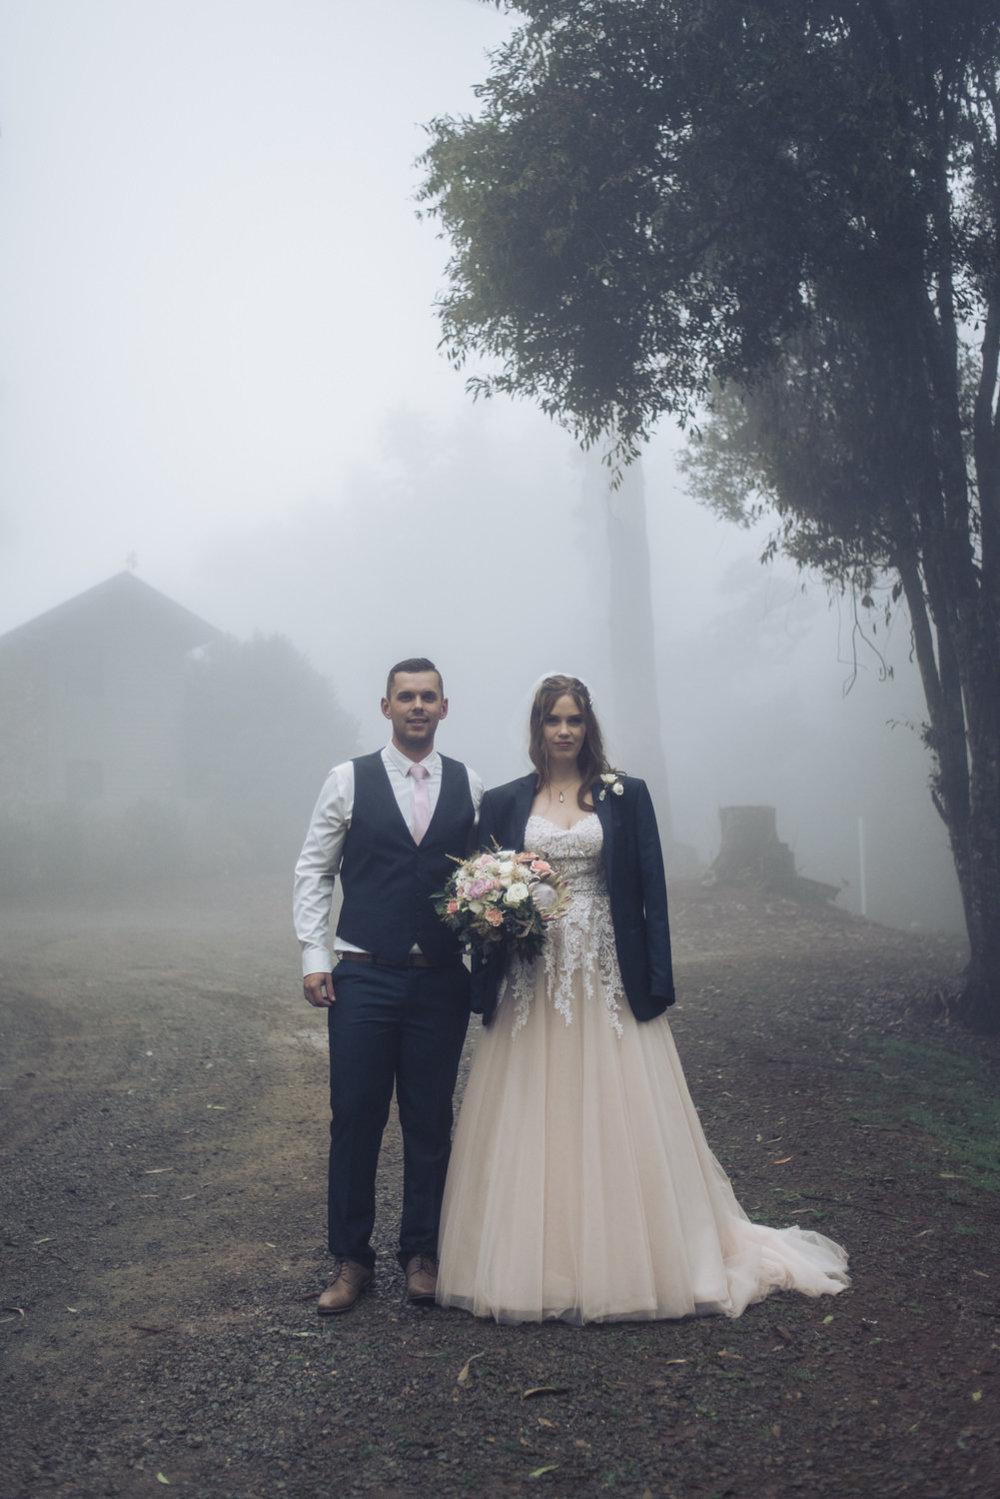 Mt-tamborine-wedding-st-bernards-83.jpg